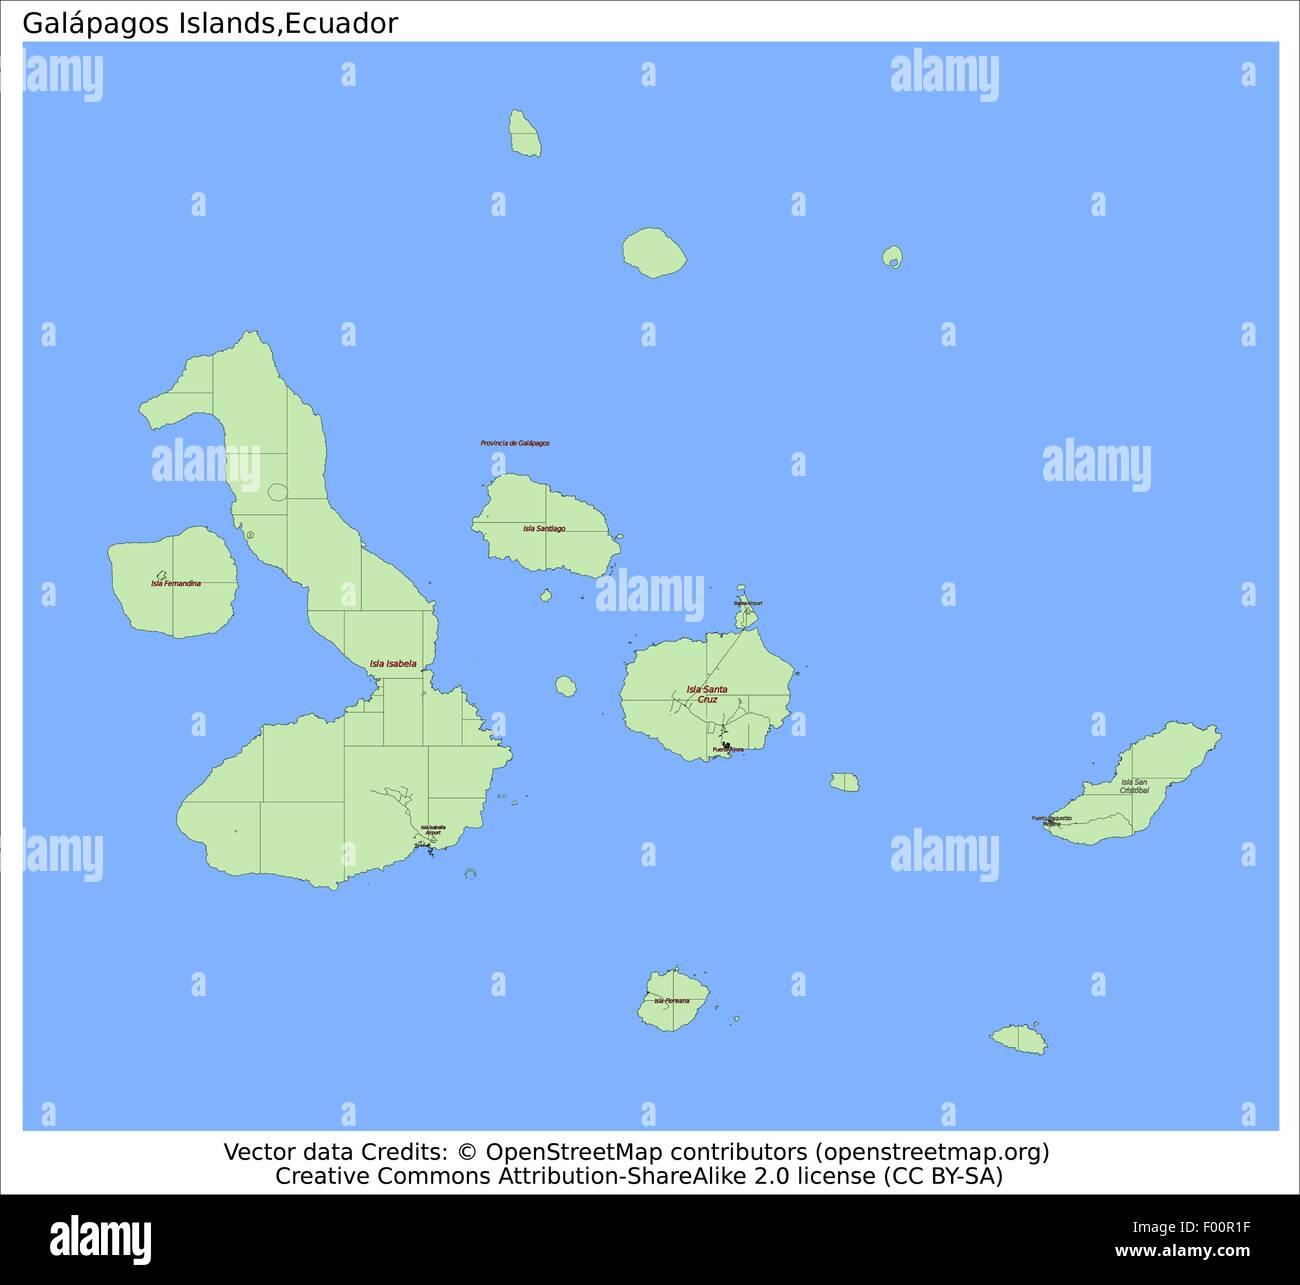 Galapagos Islands Ecuador Country City Island State Location